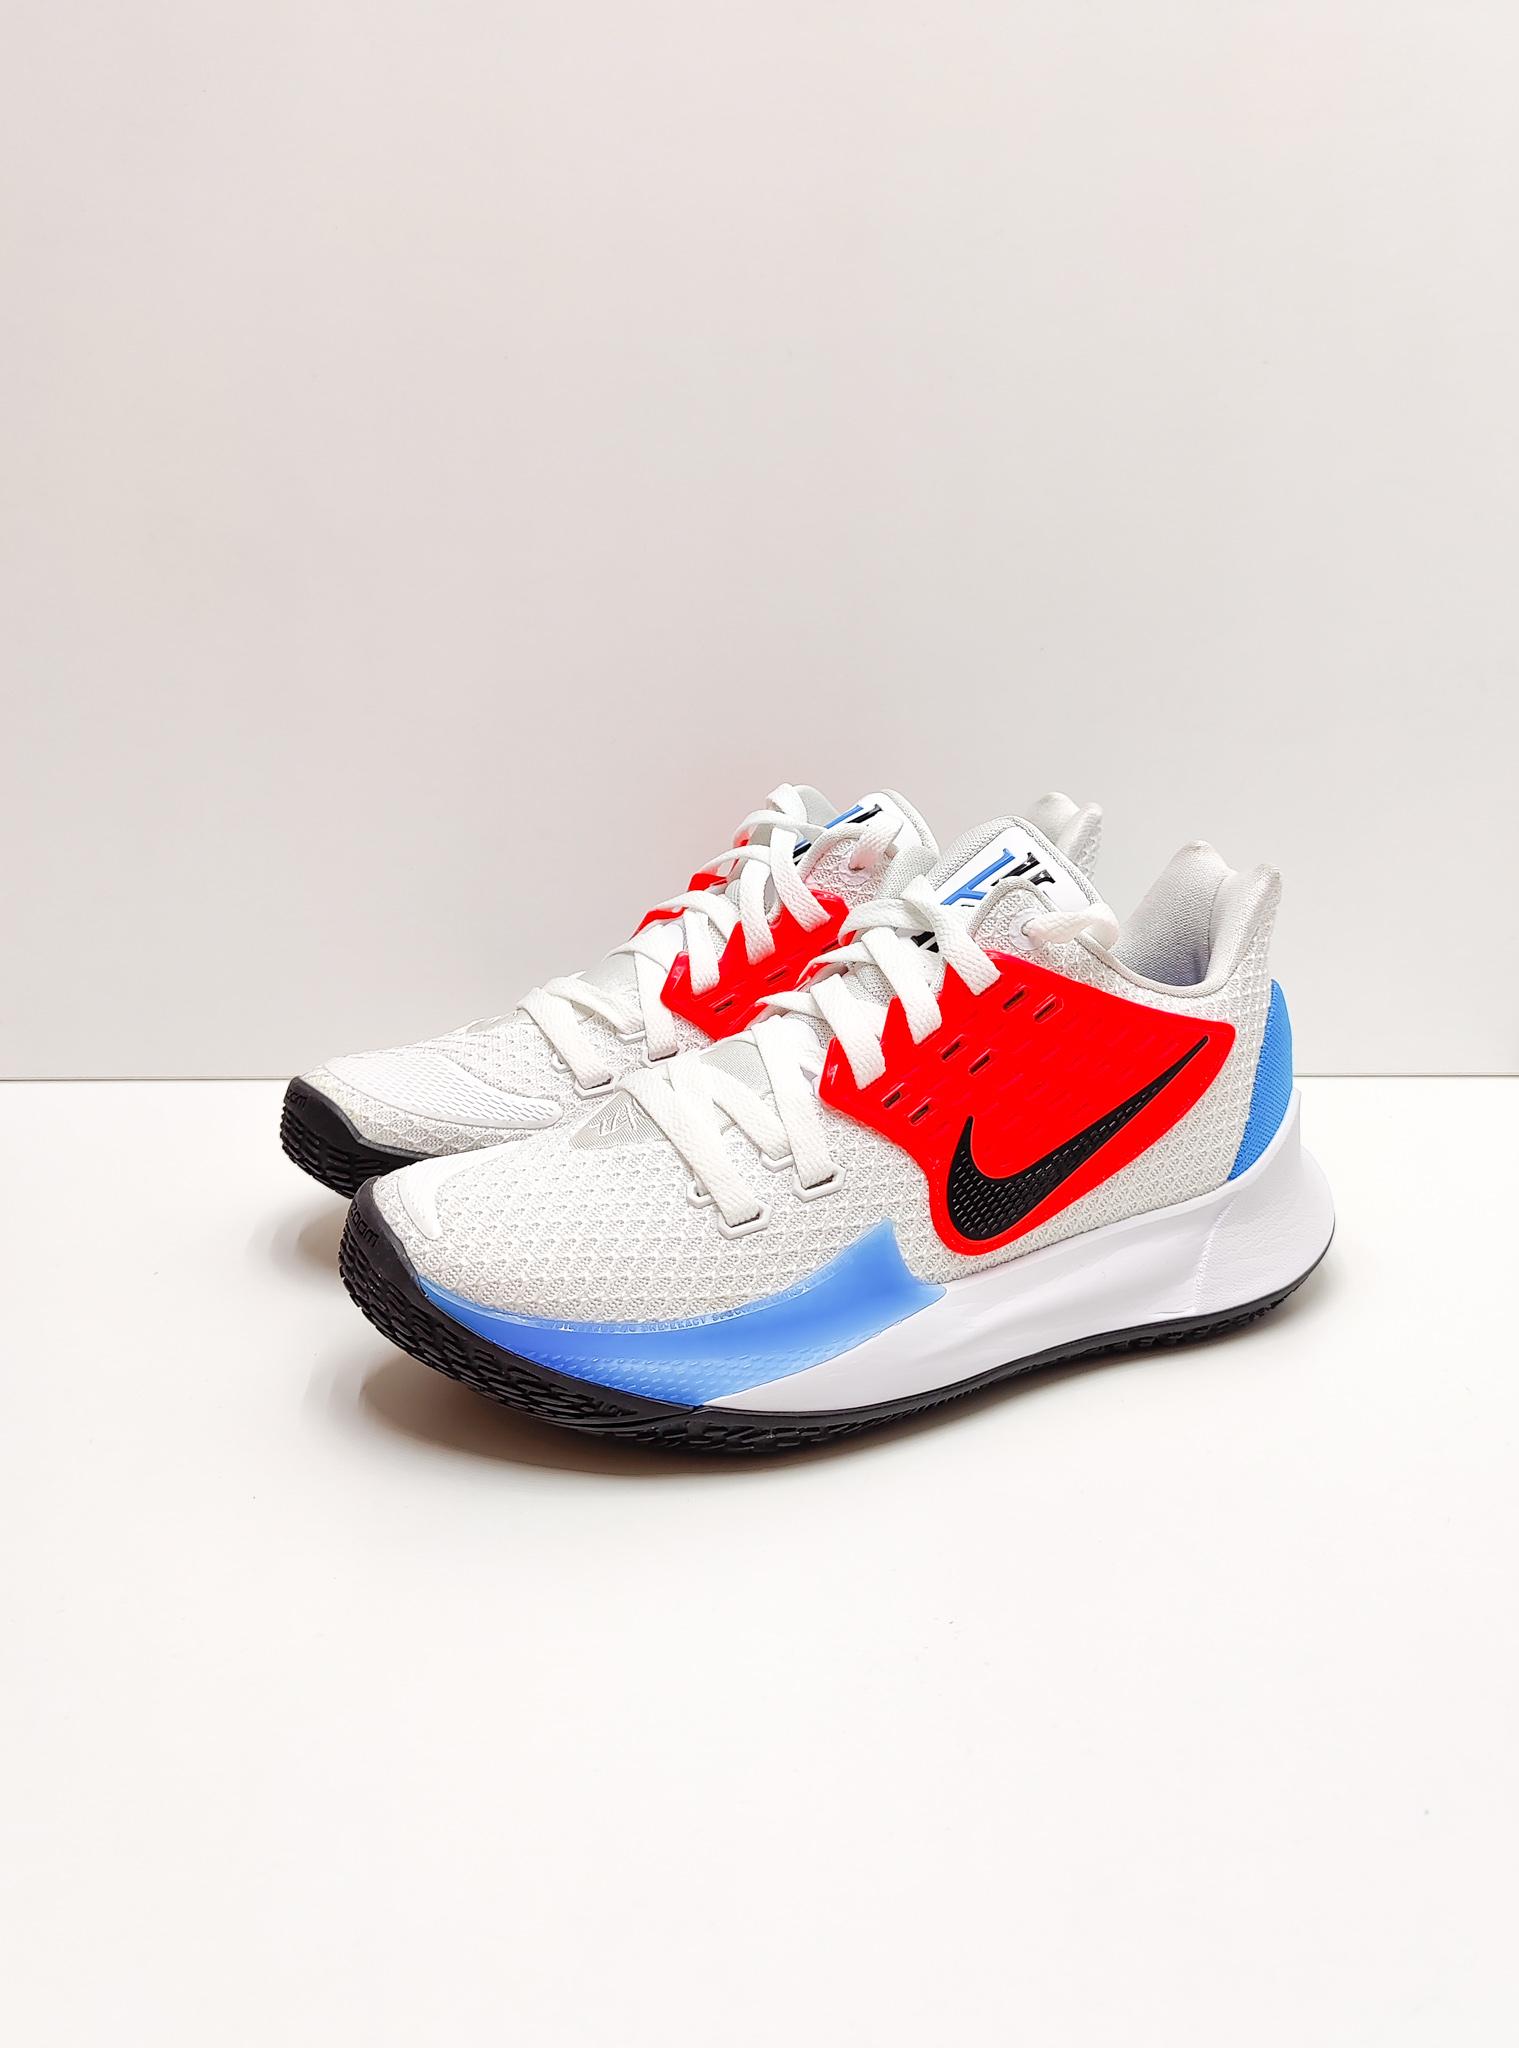 Nike Kyrie Low 2 Blue Hero